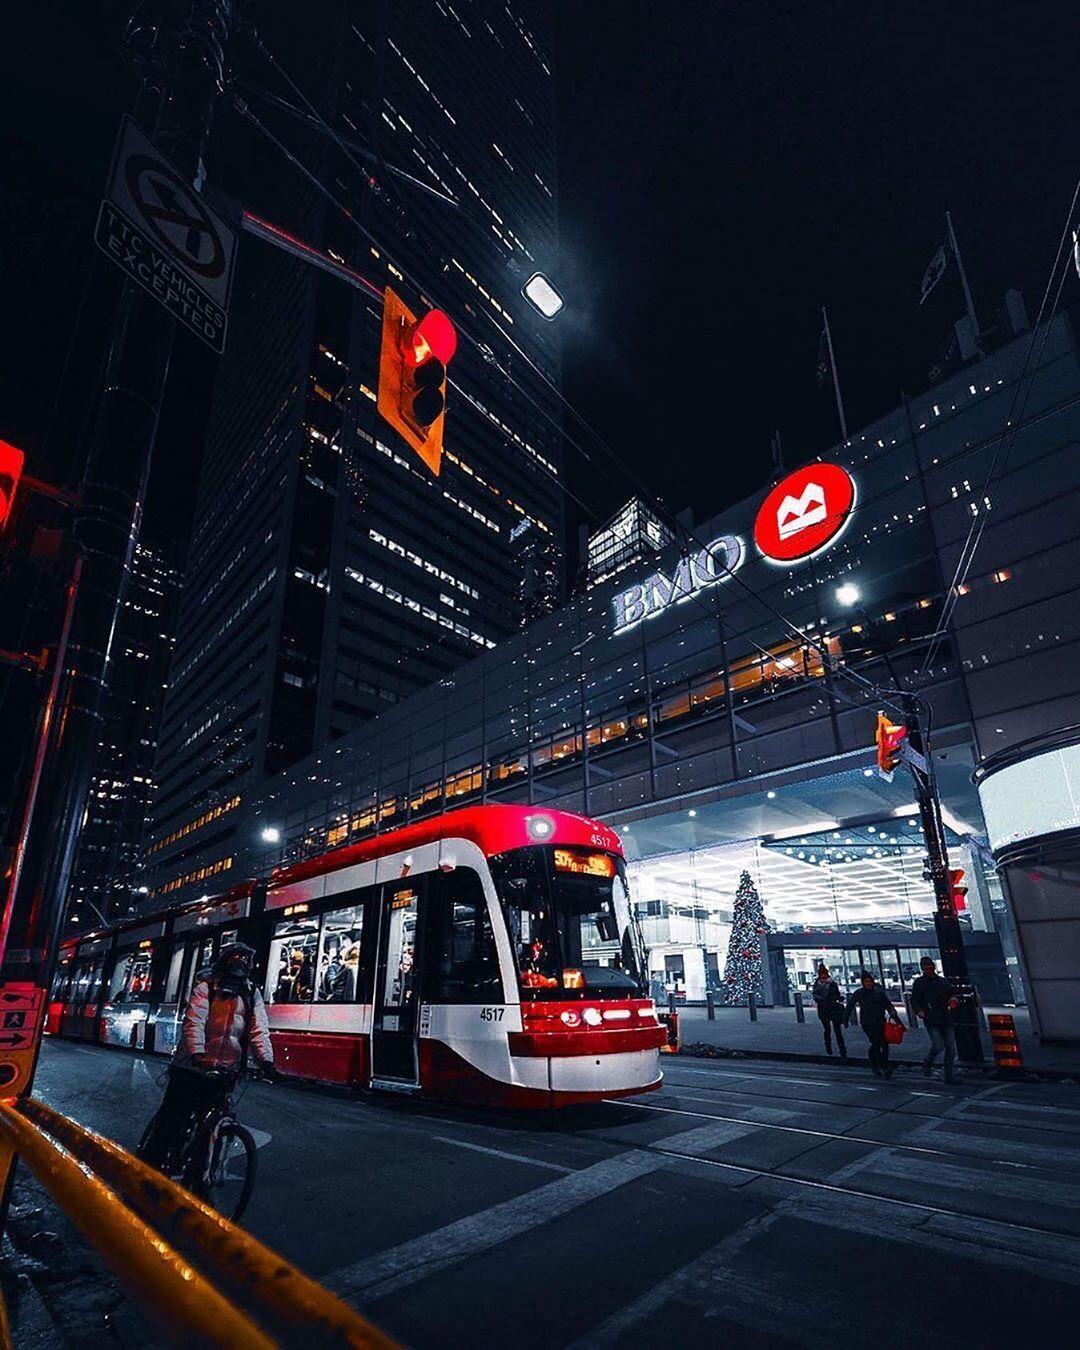 3 924 Likes 37 Comments Blogto Blogto On Instagram City Nights Toronto Night Ttc Streetcar Financialdistric Street Cars Financial District City Toronto tram vehicle city night lights